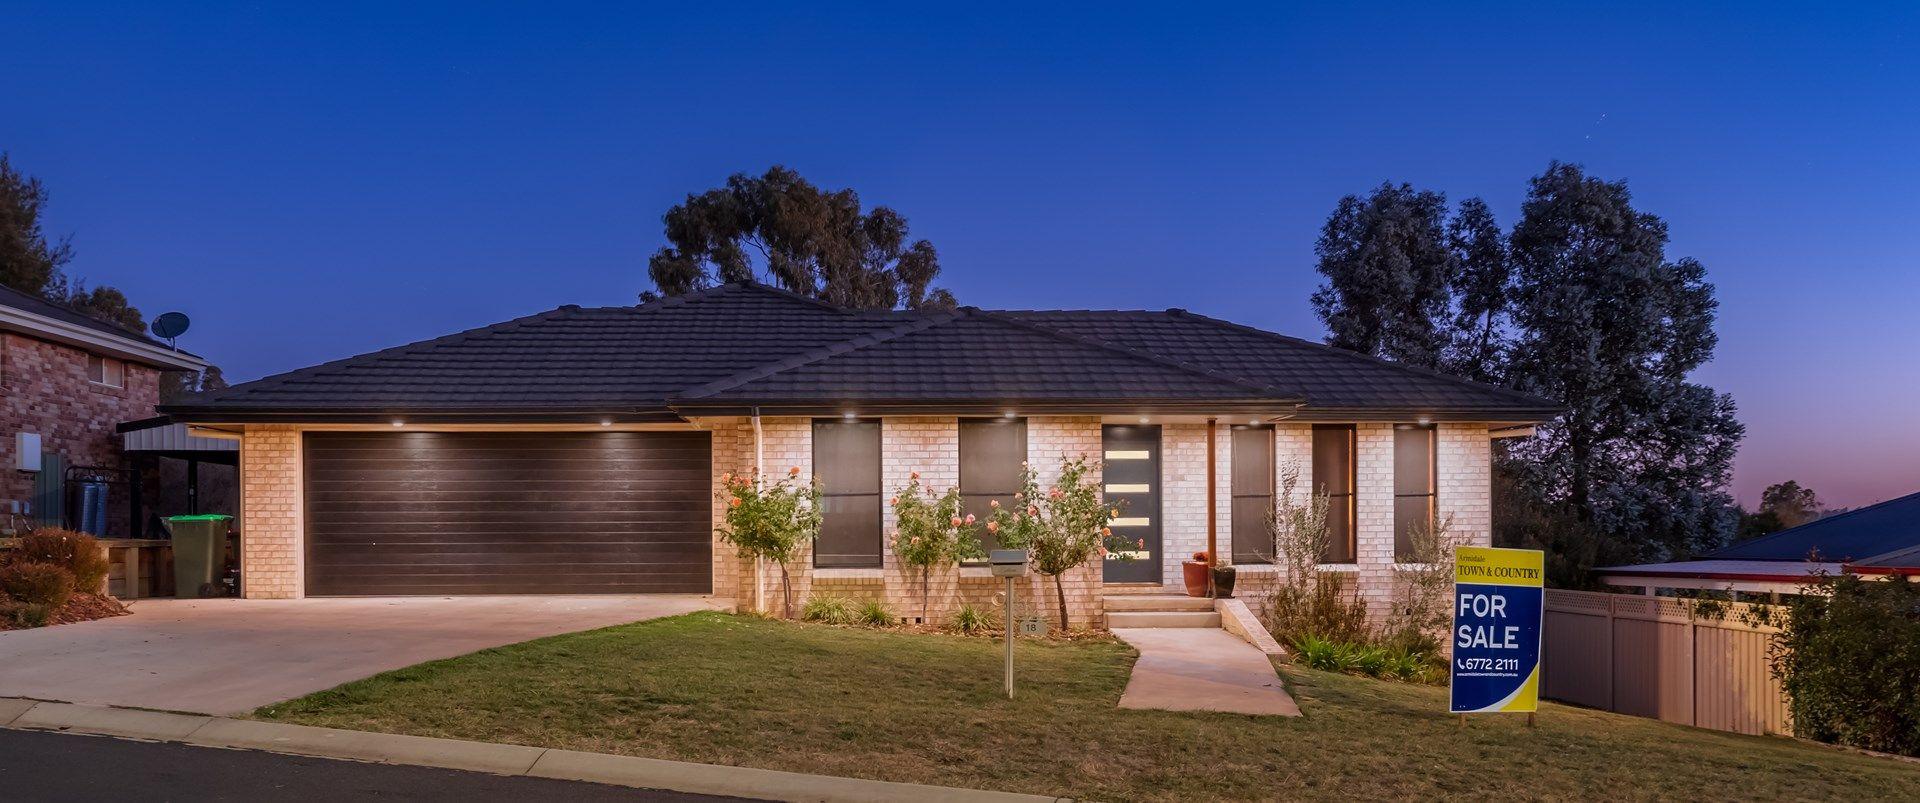 18 Amber Close, Armidale NSW 2350, Image 0